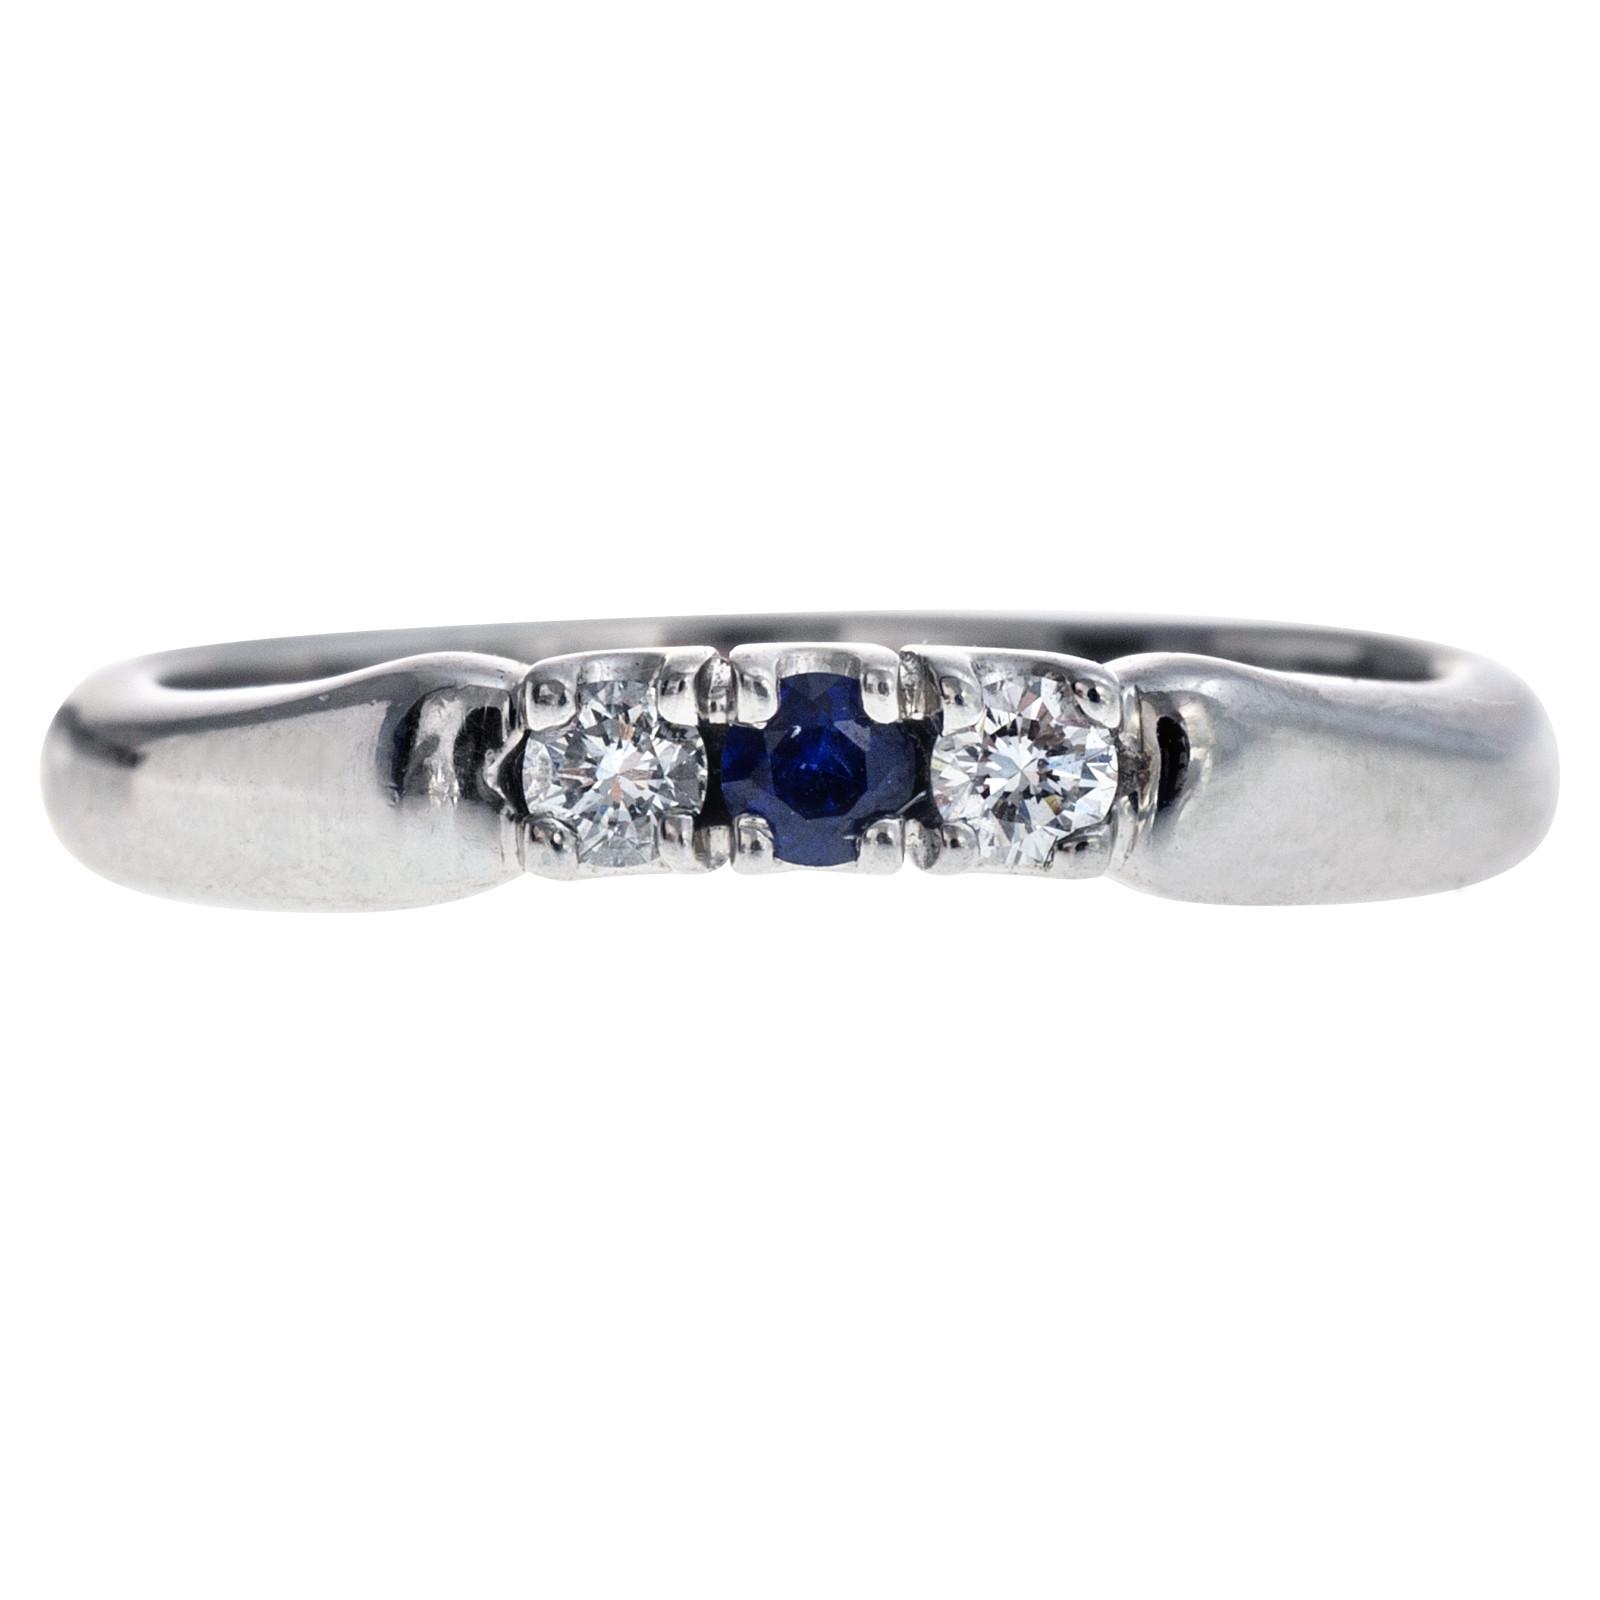 Vintage Platinum Diamond & Sapphire Ring